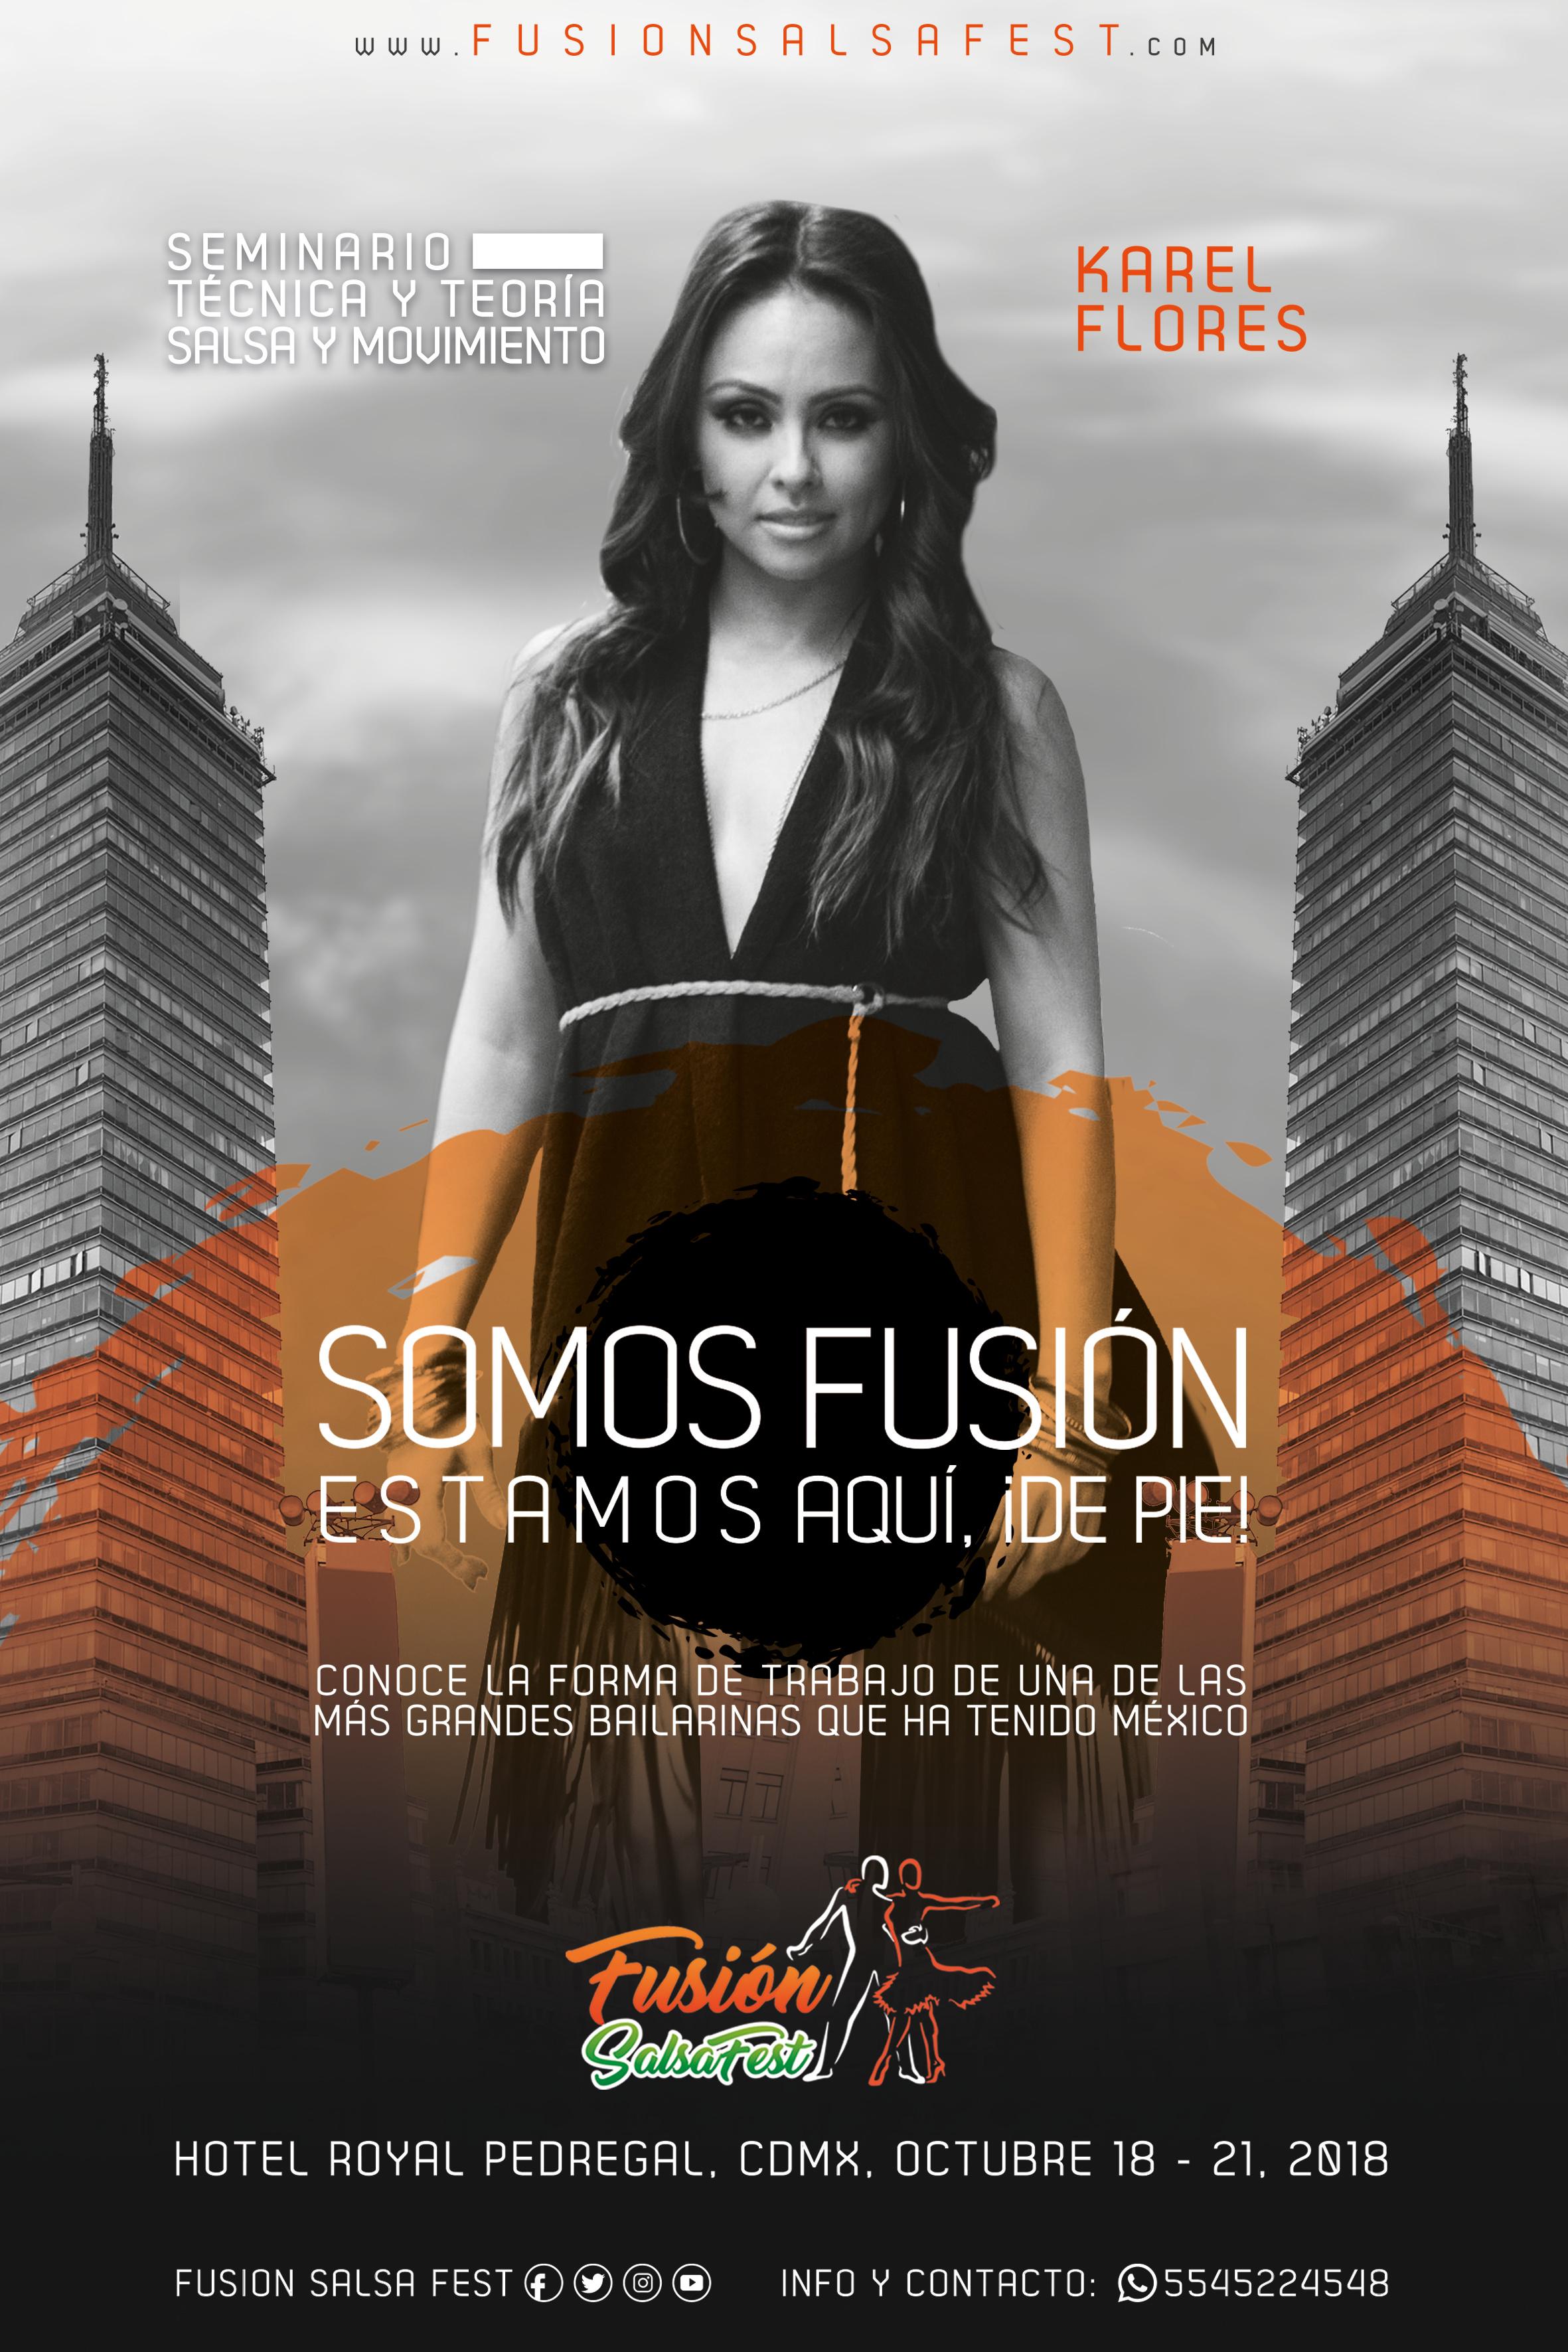 Seminario Fusion_Karel Flores